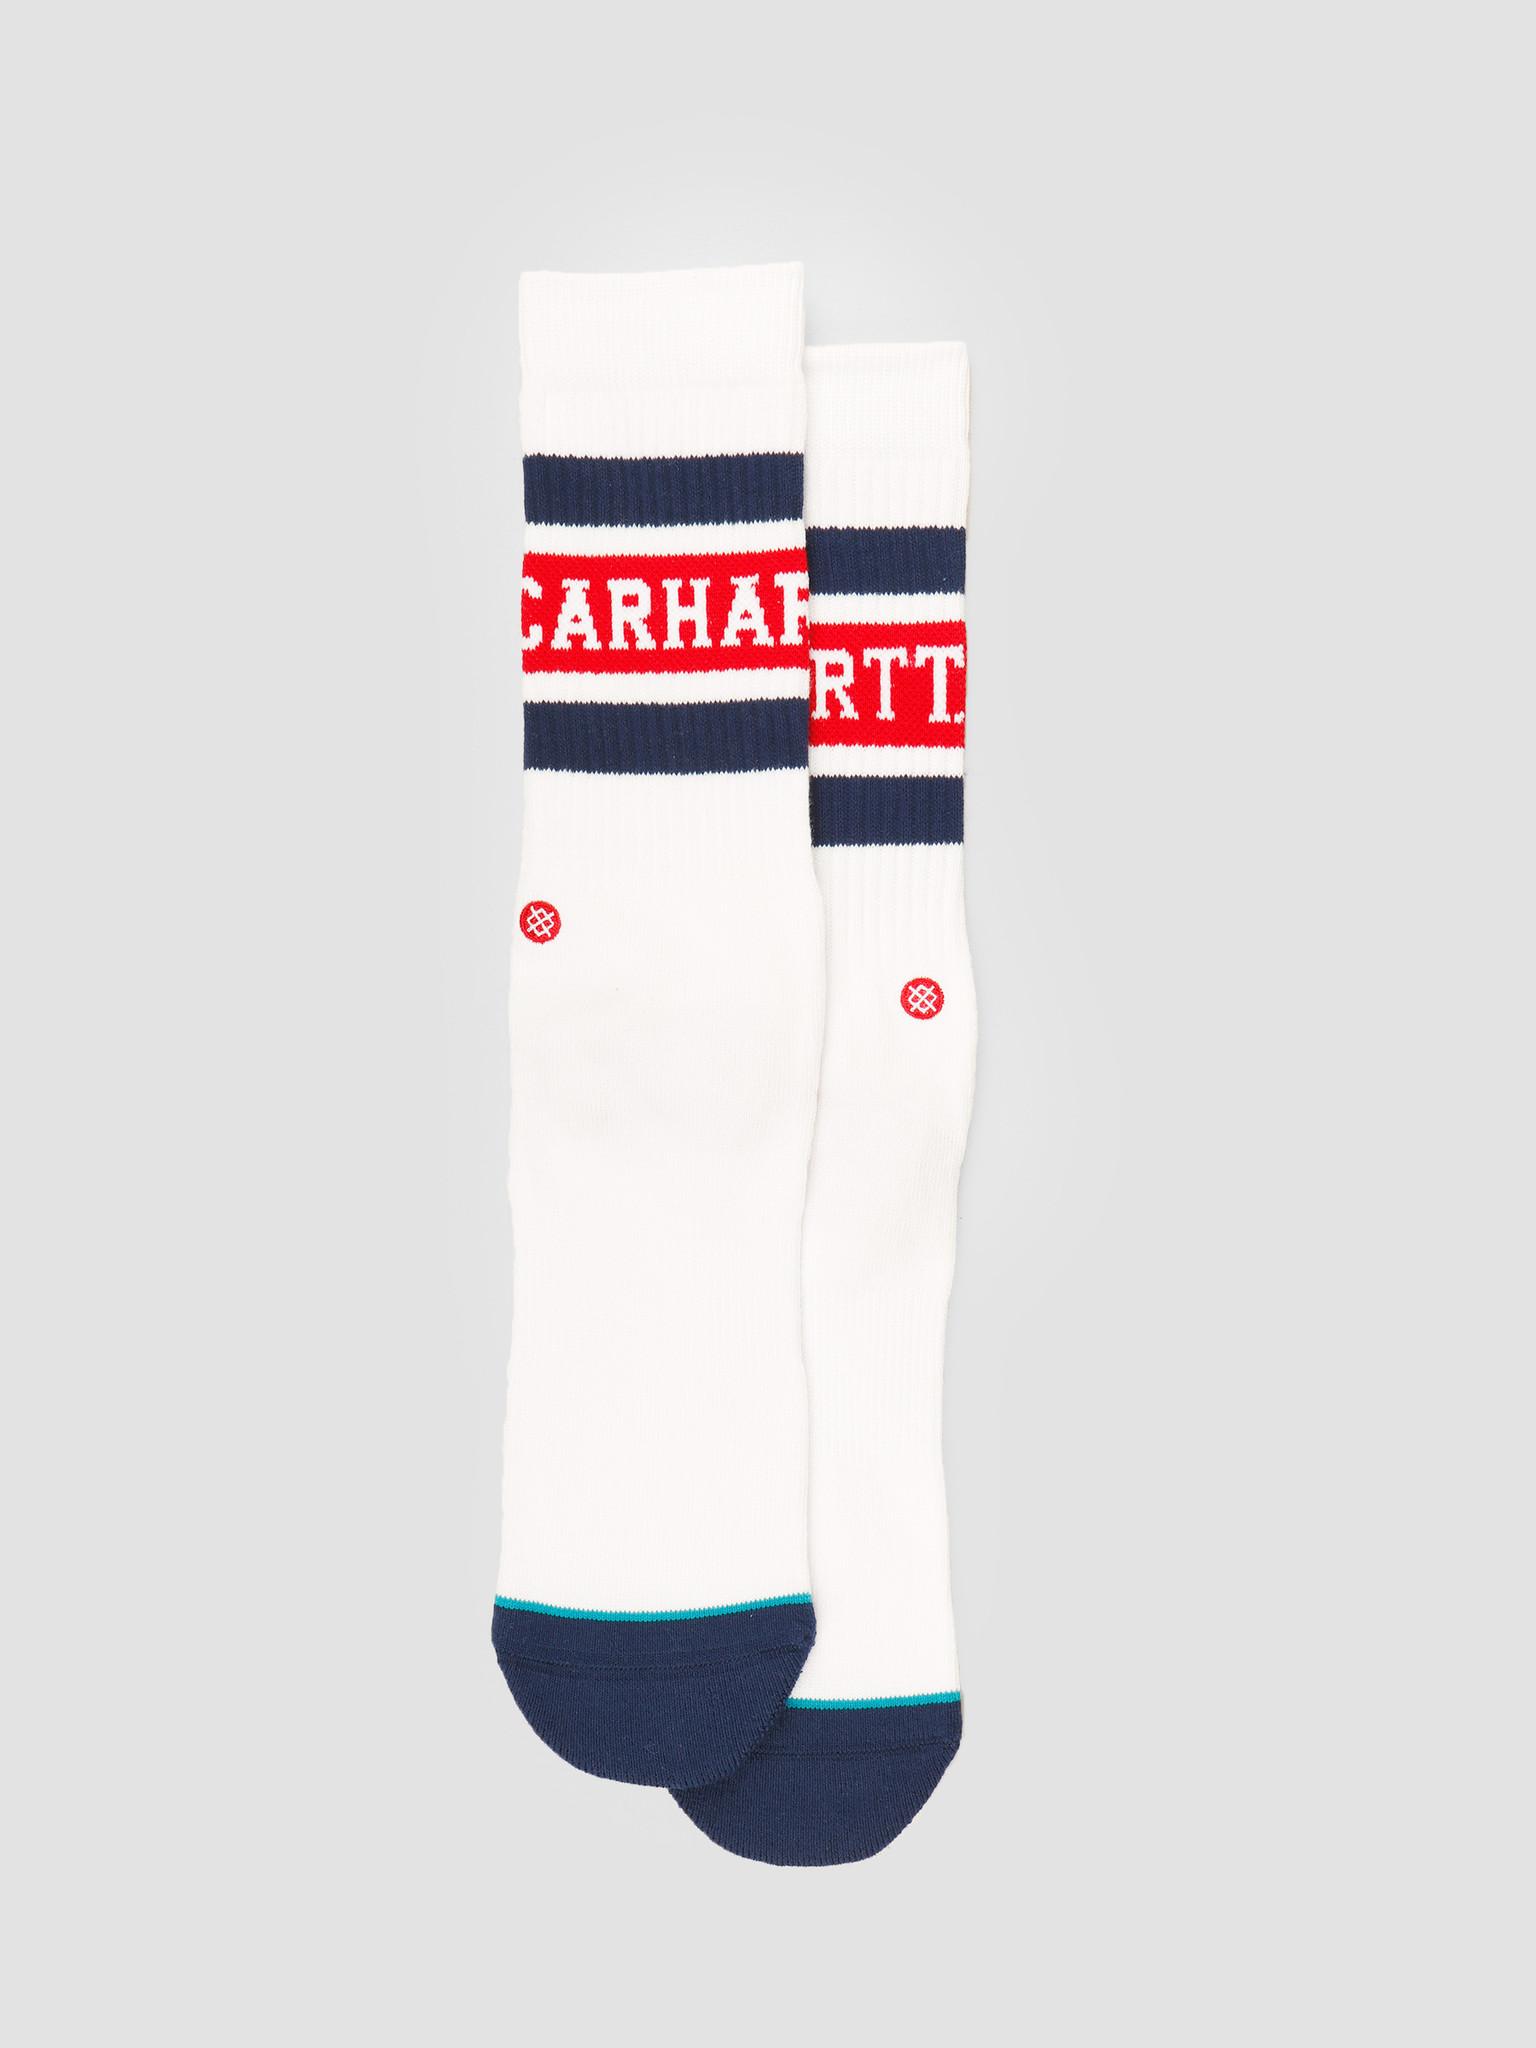 Carhartt WIP Carhartt WIP X Stance Strike Socks White Blue Cardinal I027799